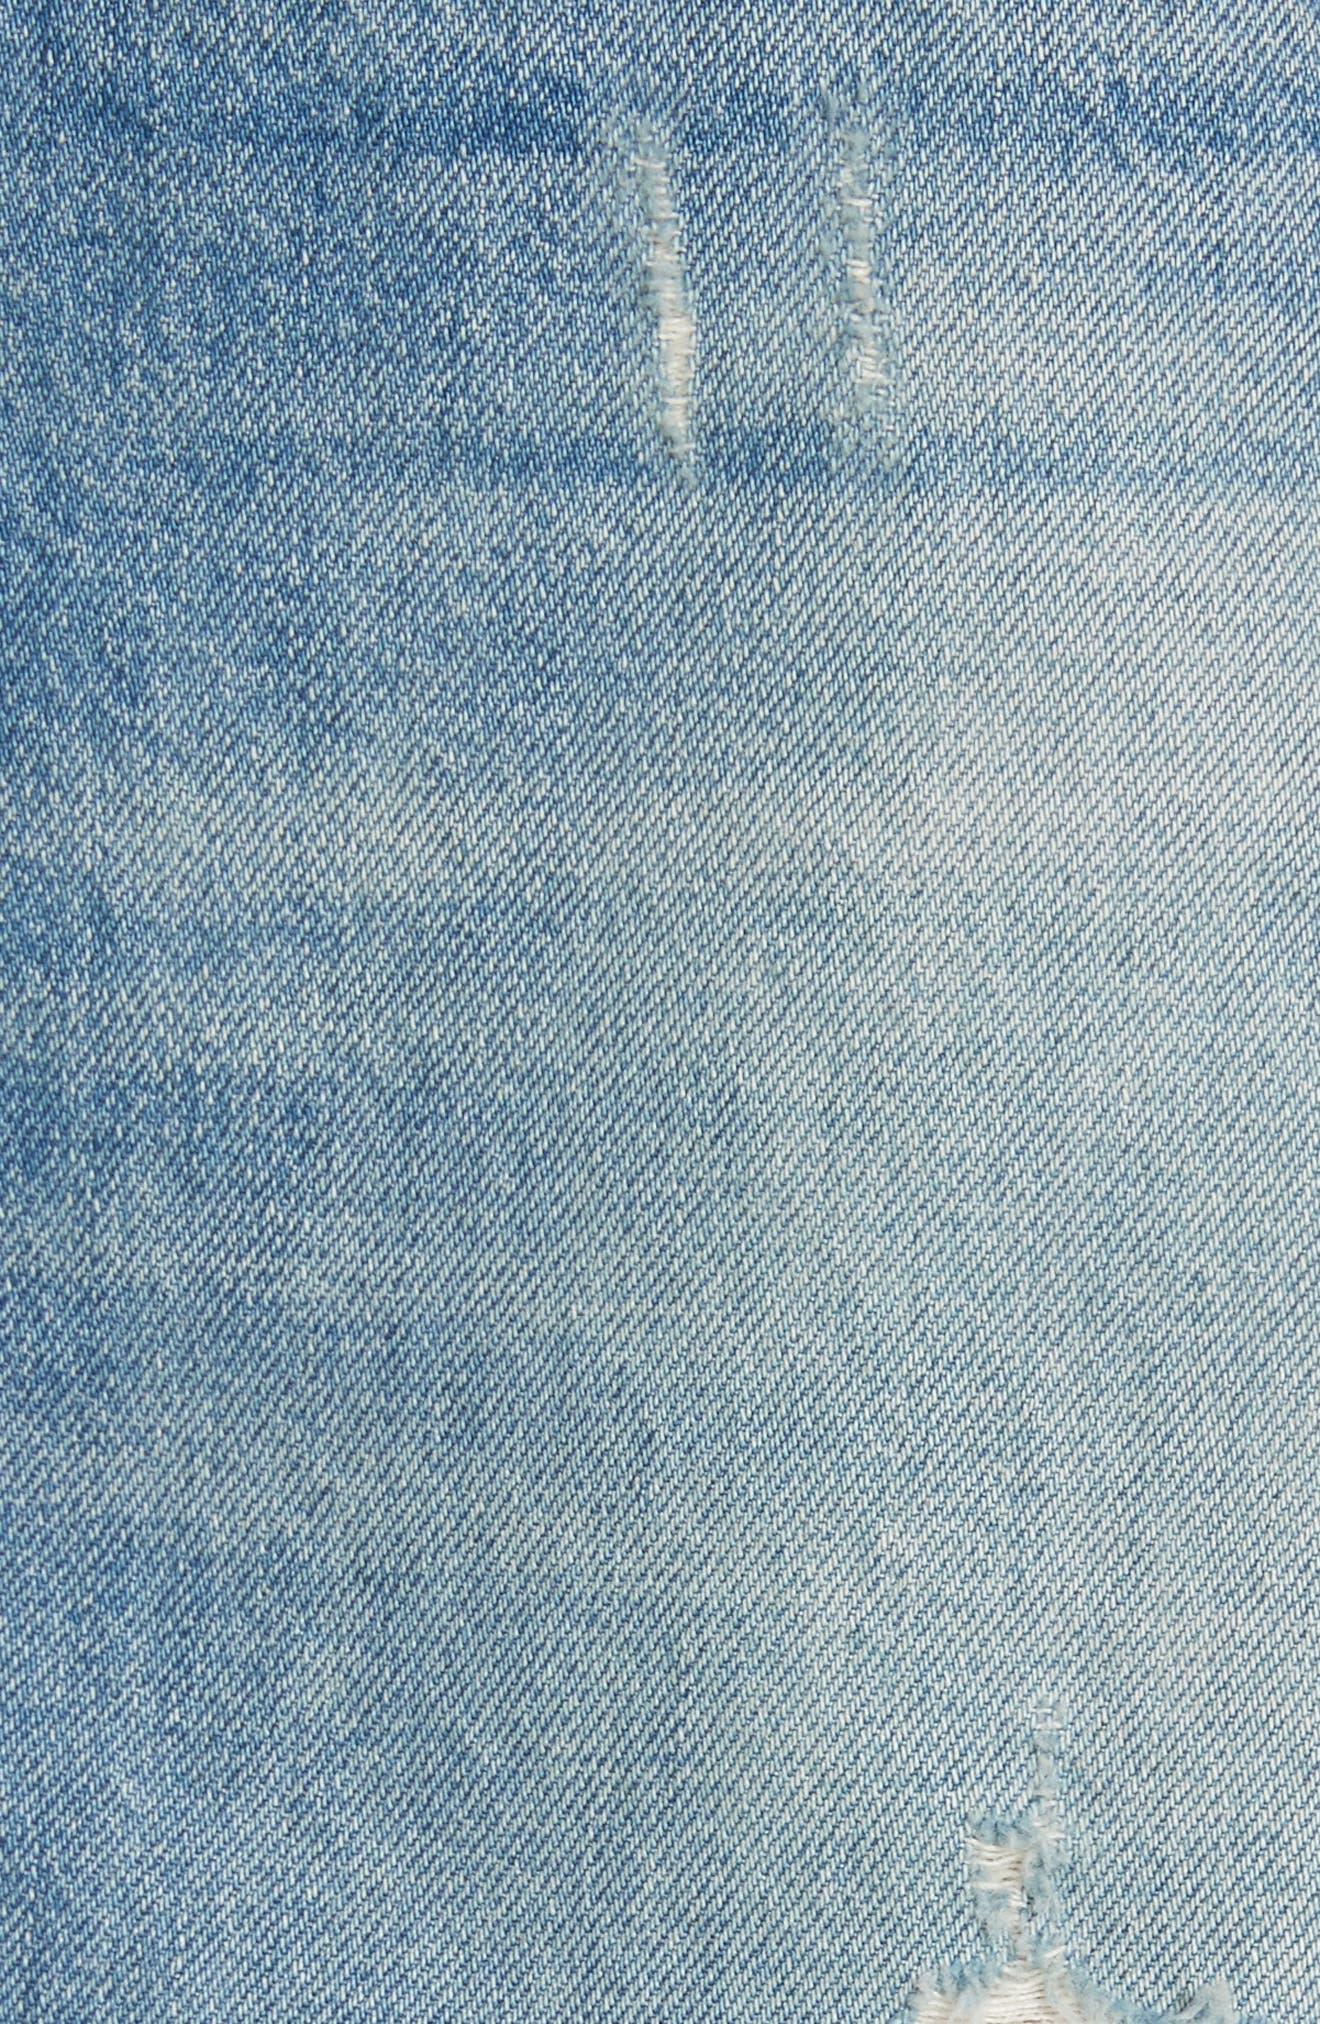 Celine Distressed Denim Skirt,                             Alternate thumbnail 5, color,                             Laz